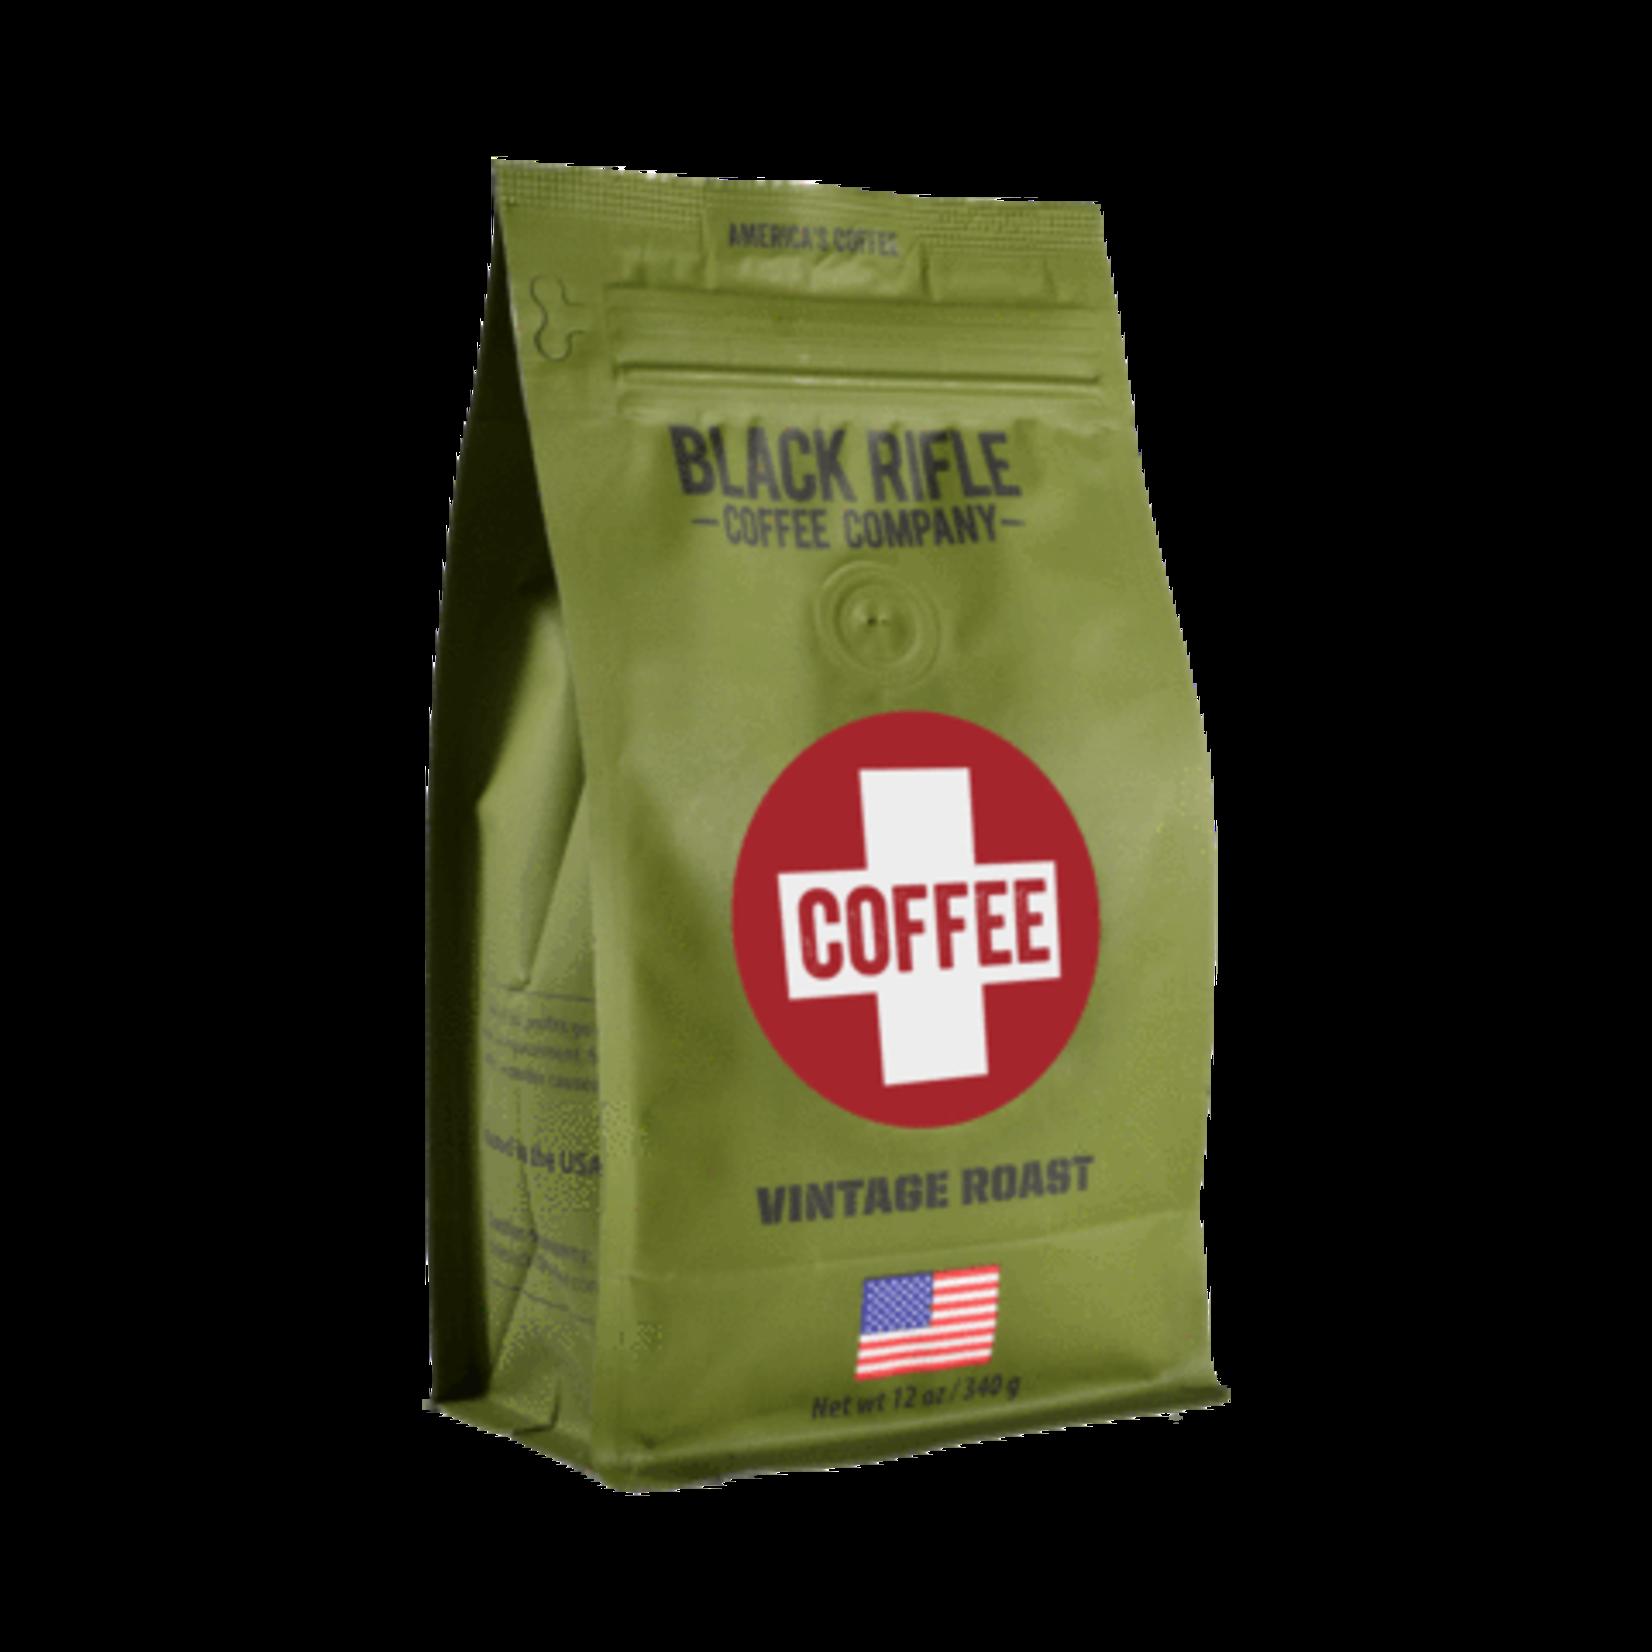 Black Rifle Coffee Coffee Saves Lives Grounds (vintage roast)